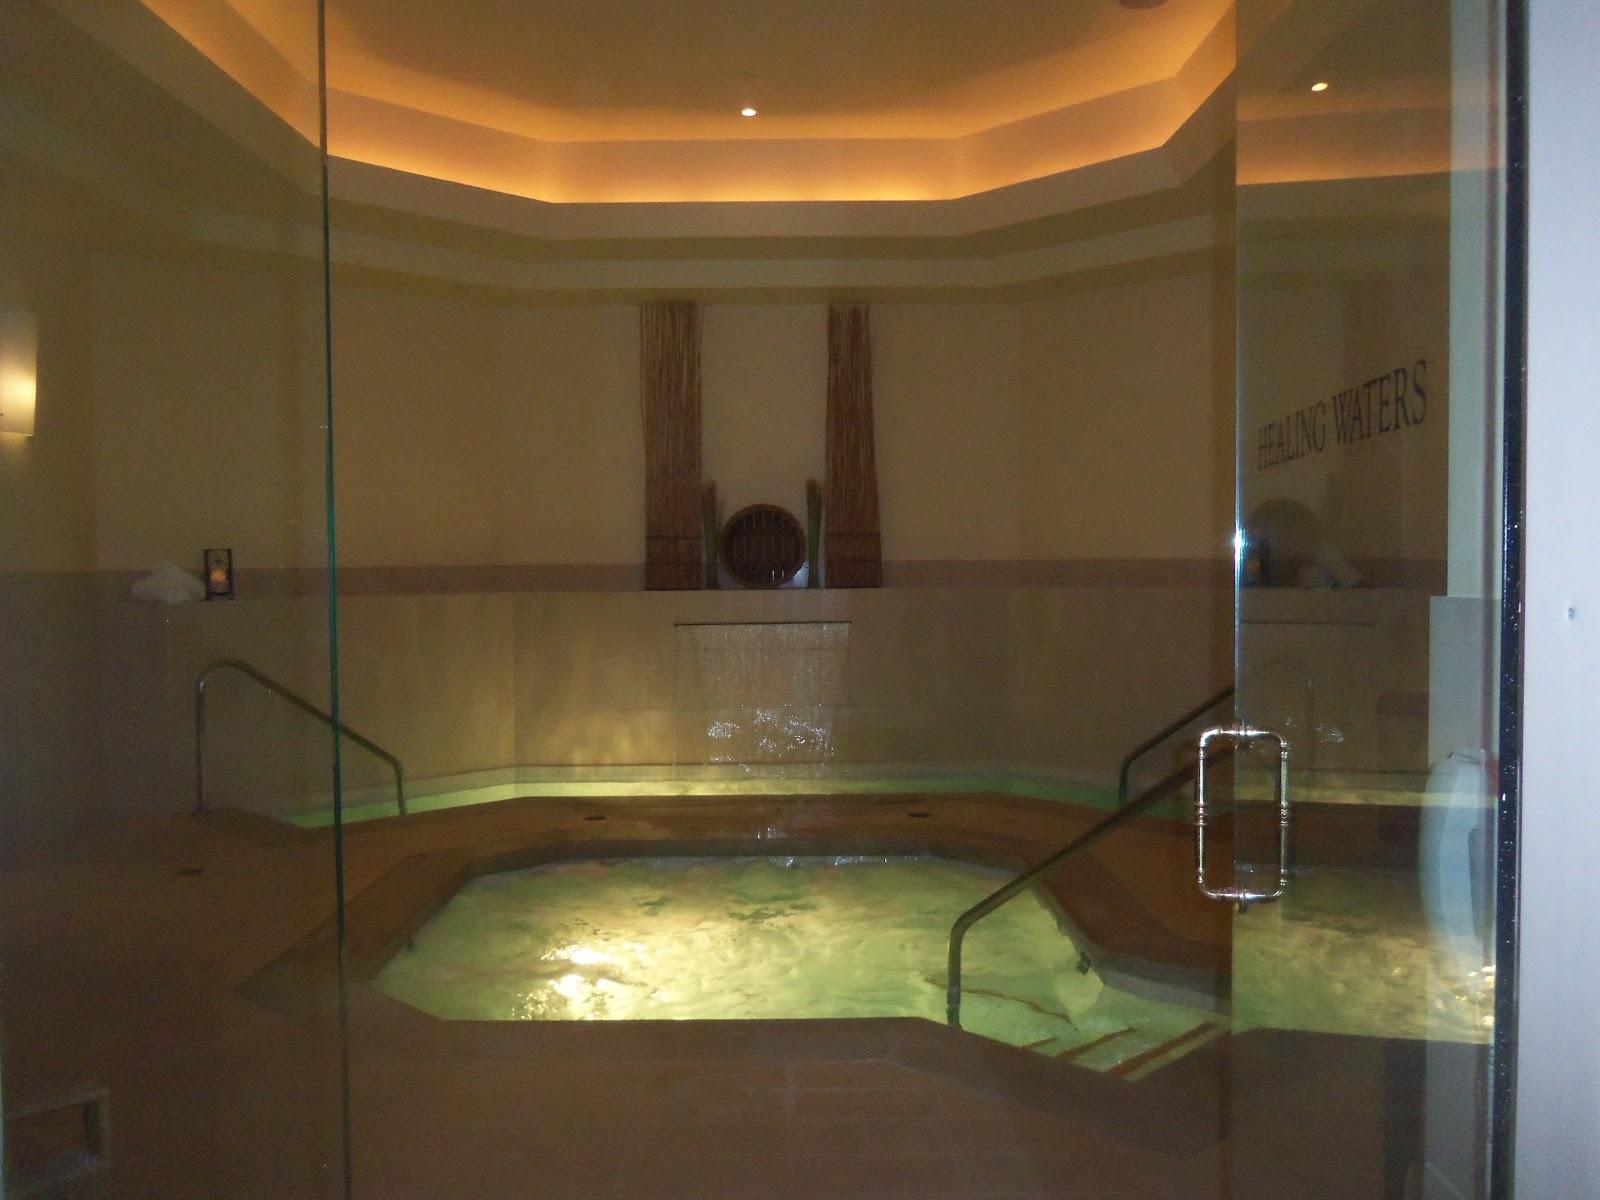 Wandsworth edwardian basement swimming pool and gym basement